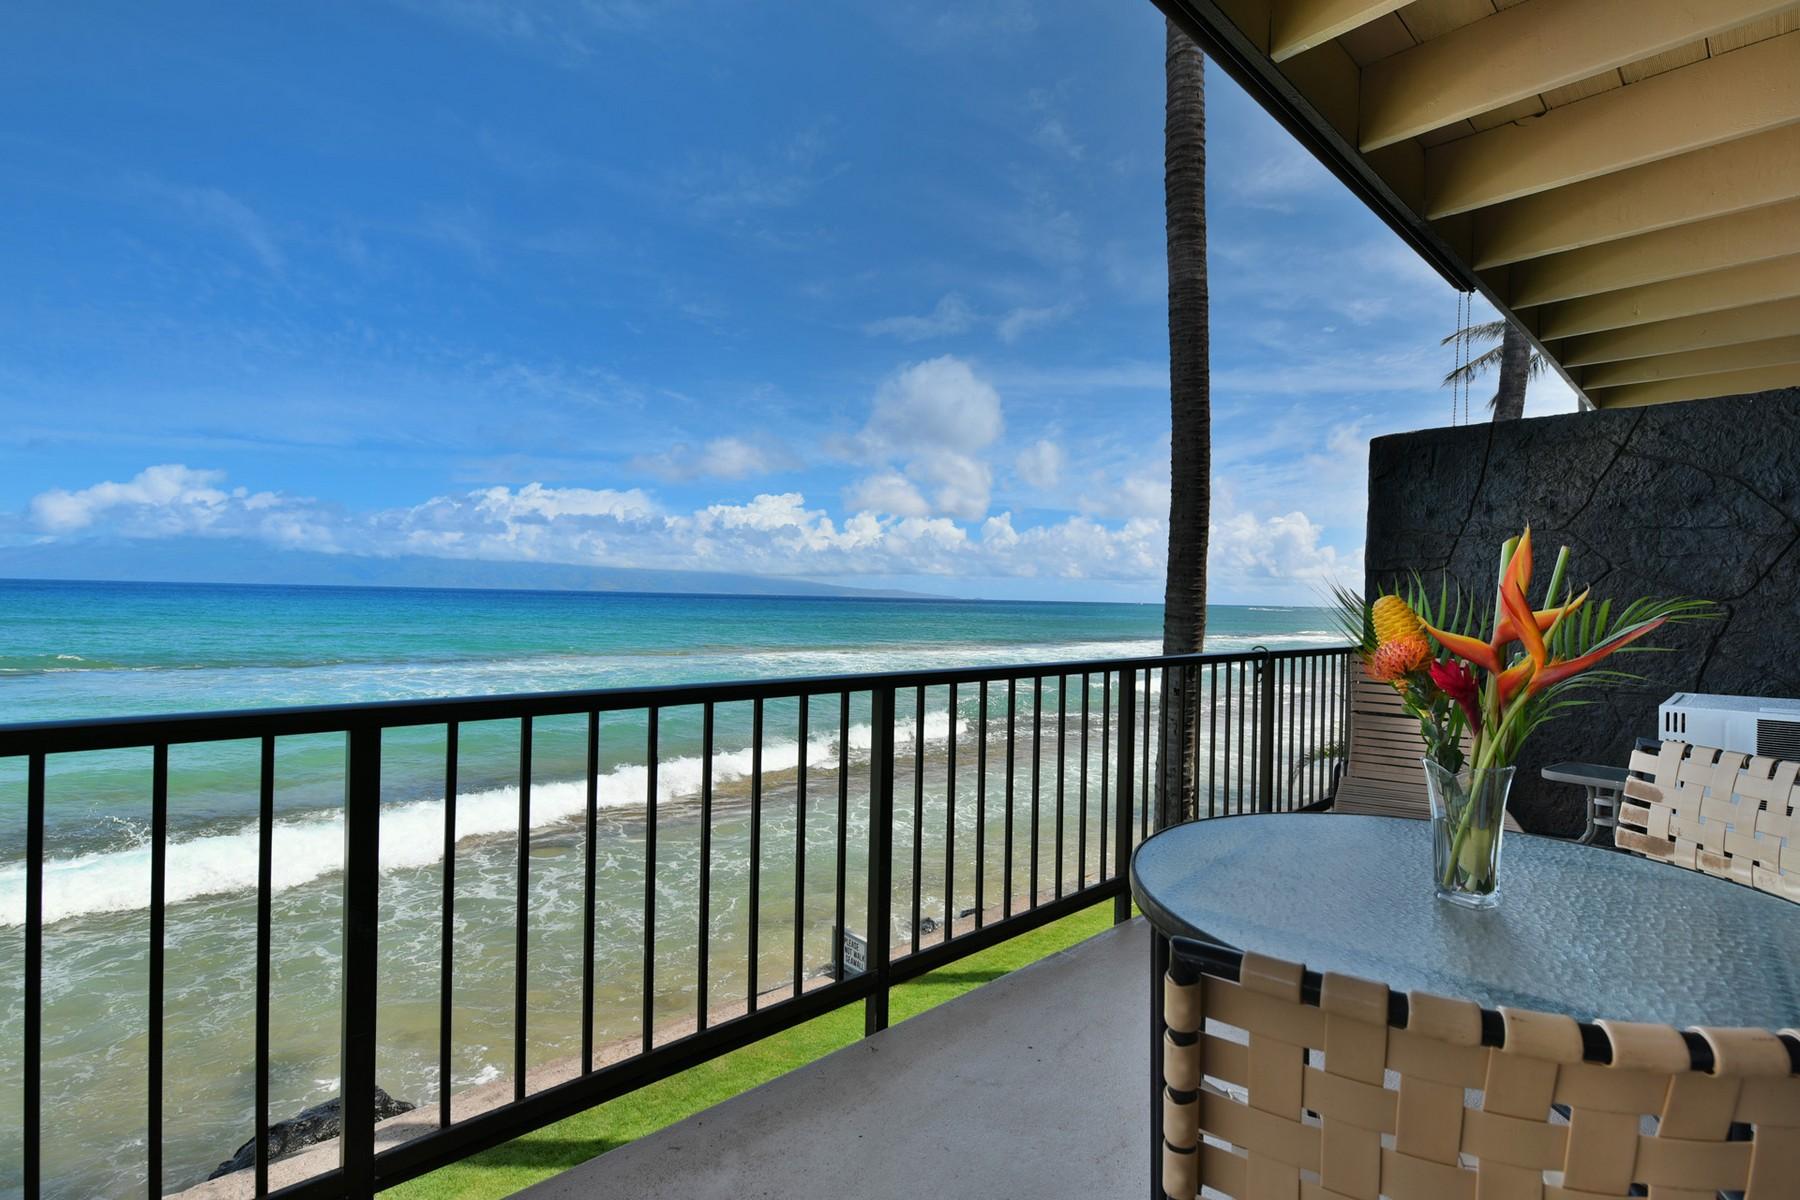 Condomínio para Venda às Stunning Ocean Front View 3559 Lower Honoapiilani Road, Maui Sands 4H Honokowai, Havaí, 96761 Estados Unidos